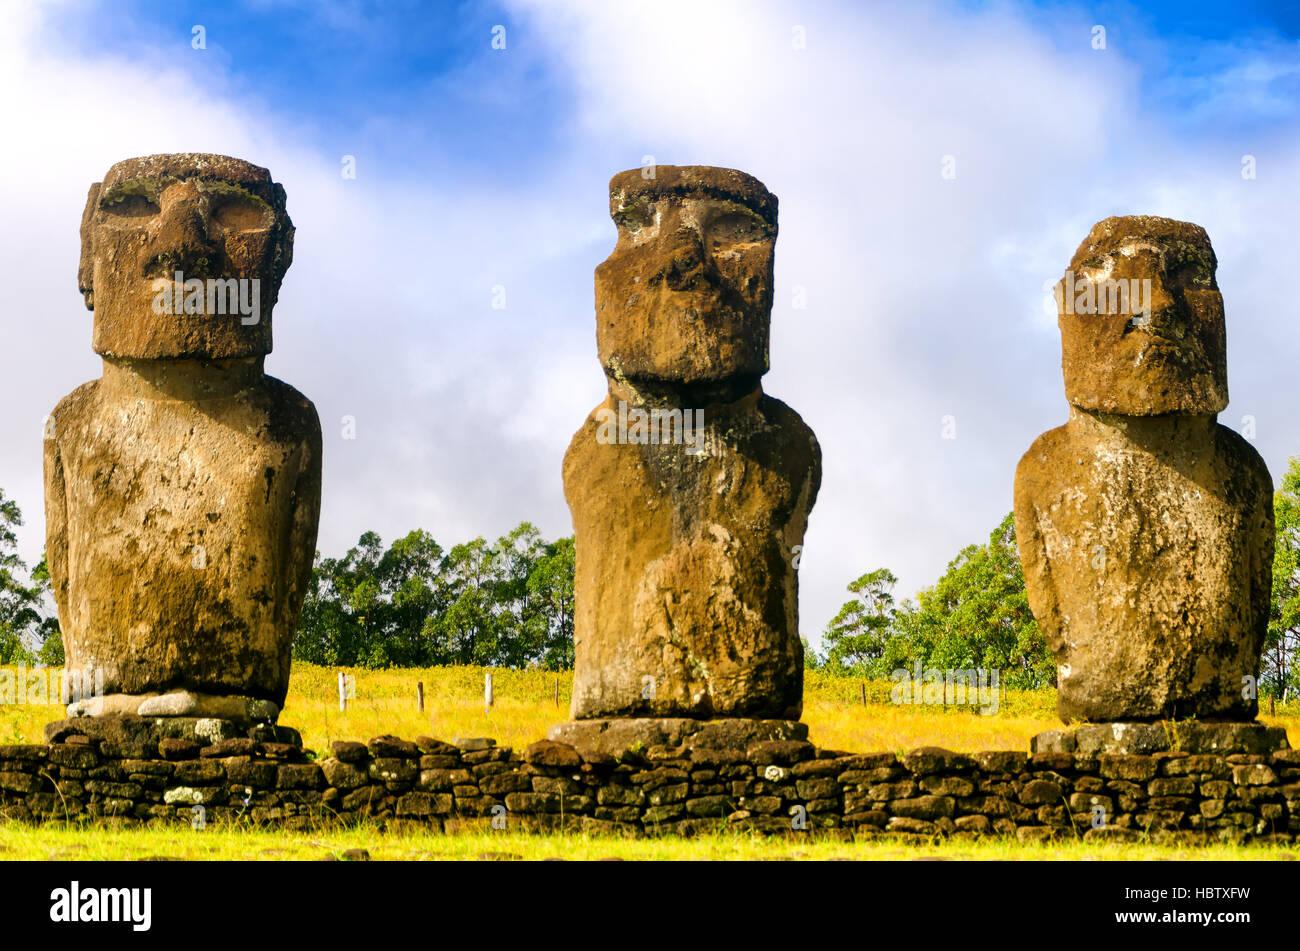 Tres estatuas moai en la Isla de Pascua, Chile Imagen De Stock